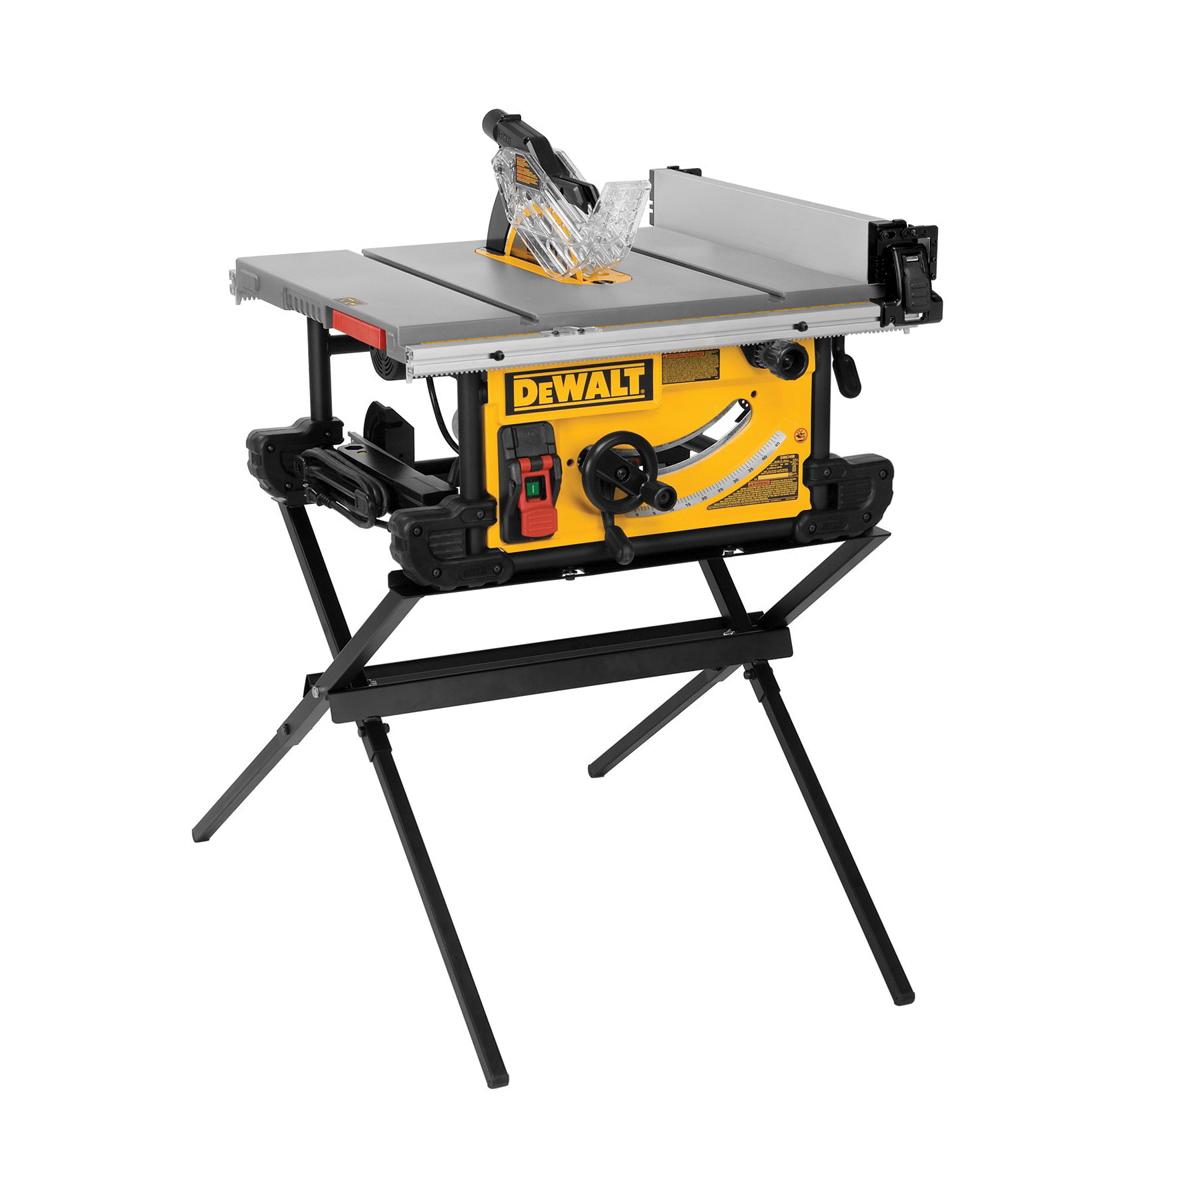 DeWALT® DWE7490X Jobsite Table Saw With Scissor Stand, 10 in Dia Blade, 5/8 in Arbor/Shank, 3-1/8 in 90 deg Capacity, 2 hp, Tool Only